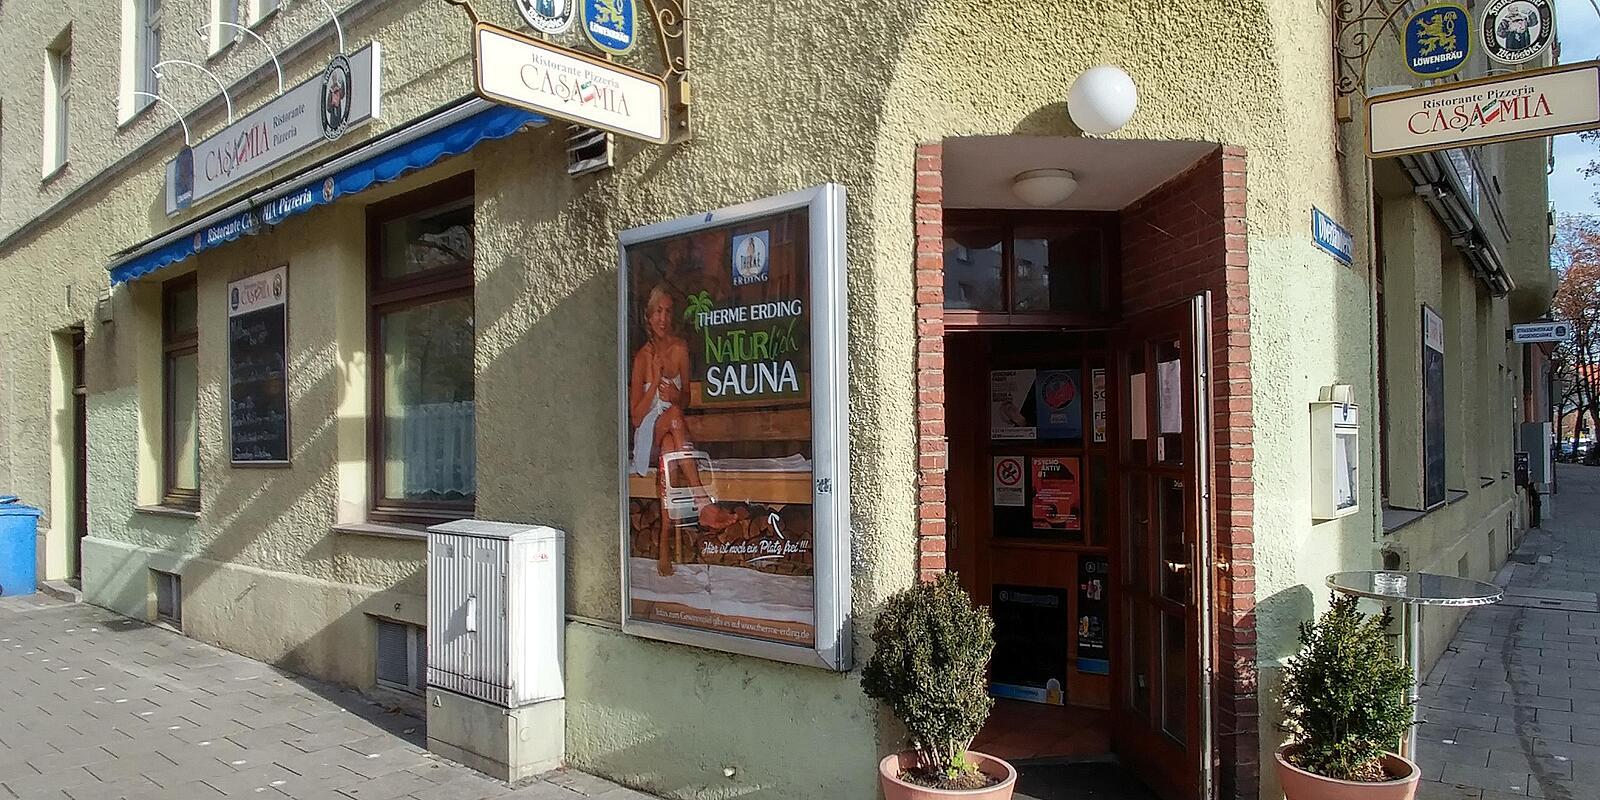 ristorante pizzeria casa mia implerstr untersendling m nchen italienisches restaurant. Black Bedroom Furniture Sets. Home Design Ideas